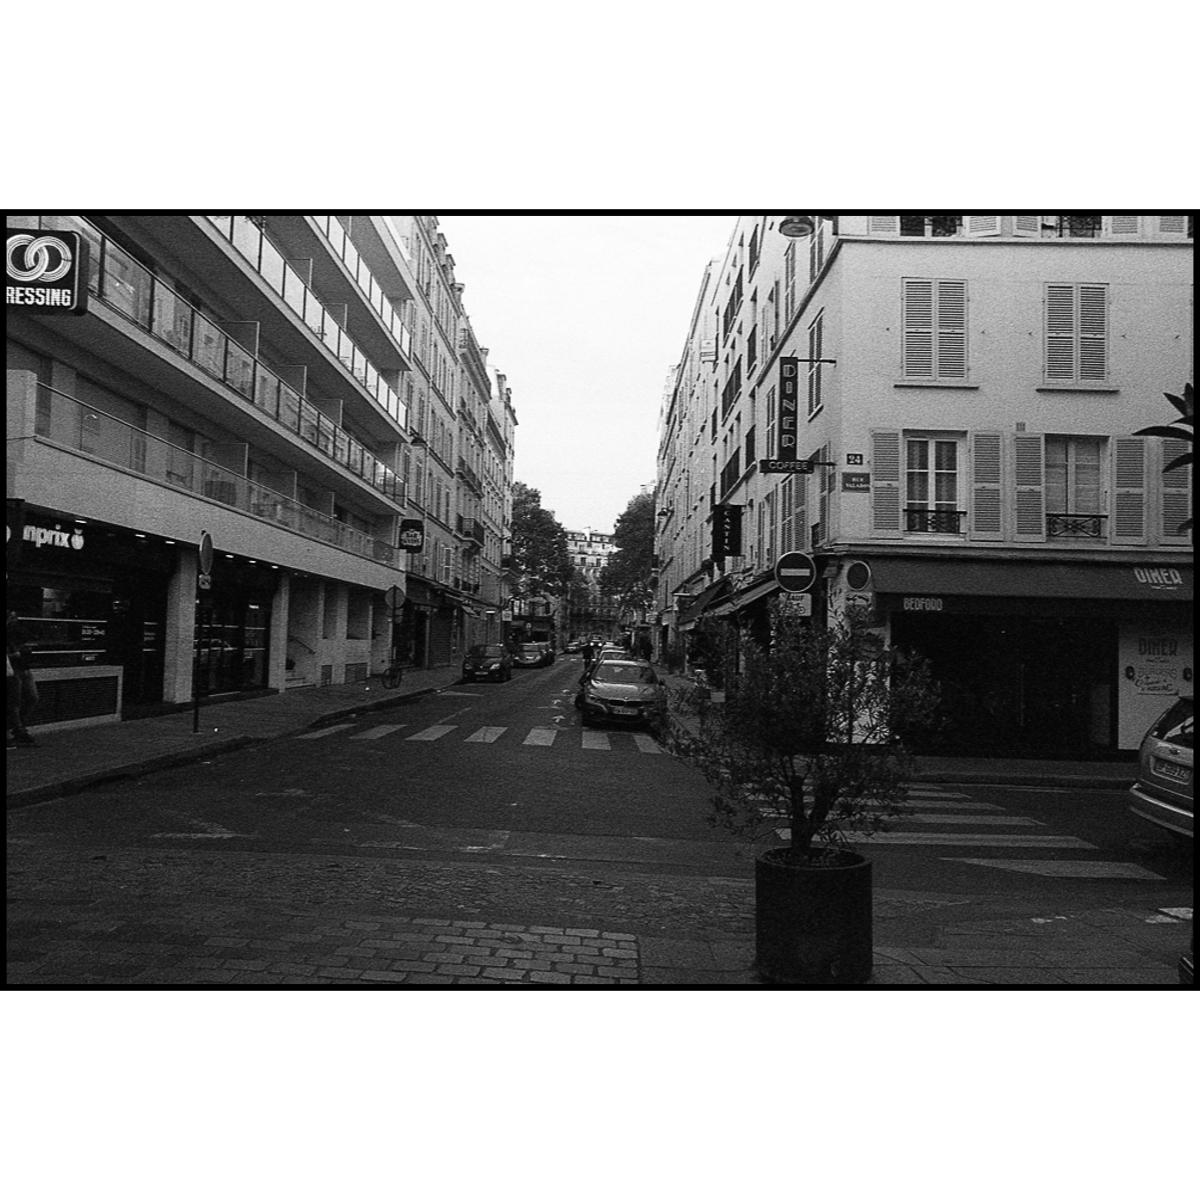 paris file-096.jpg